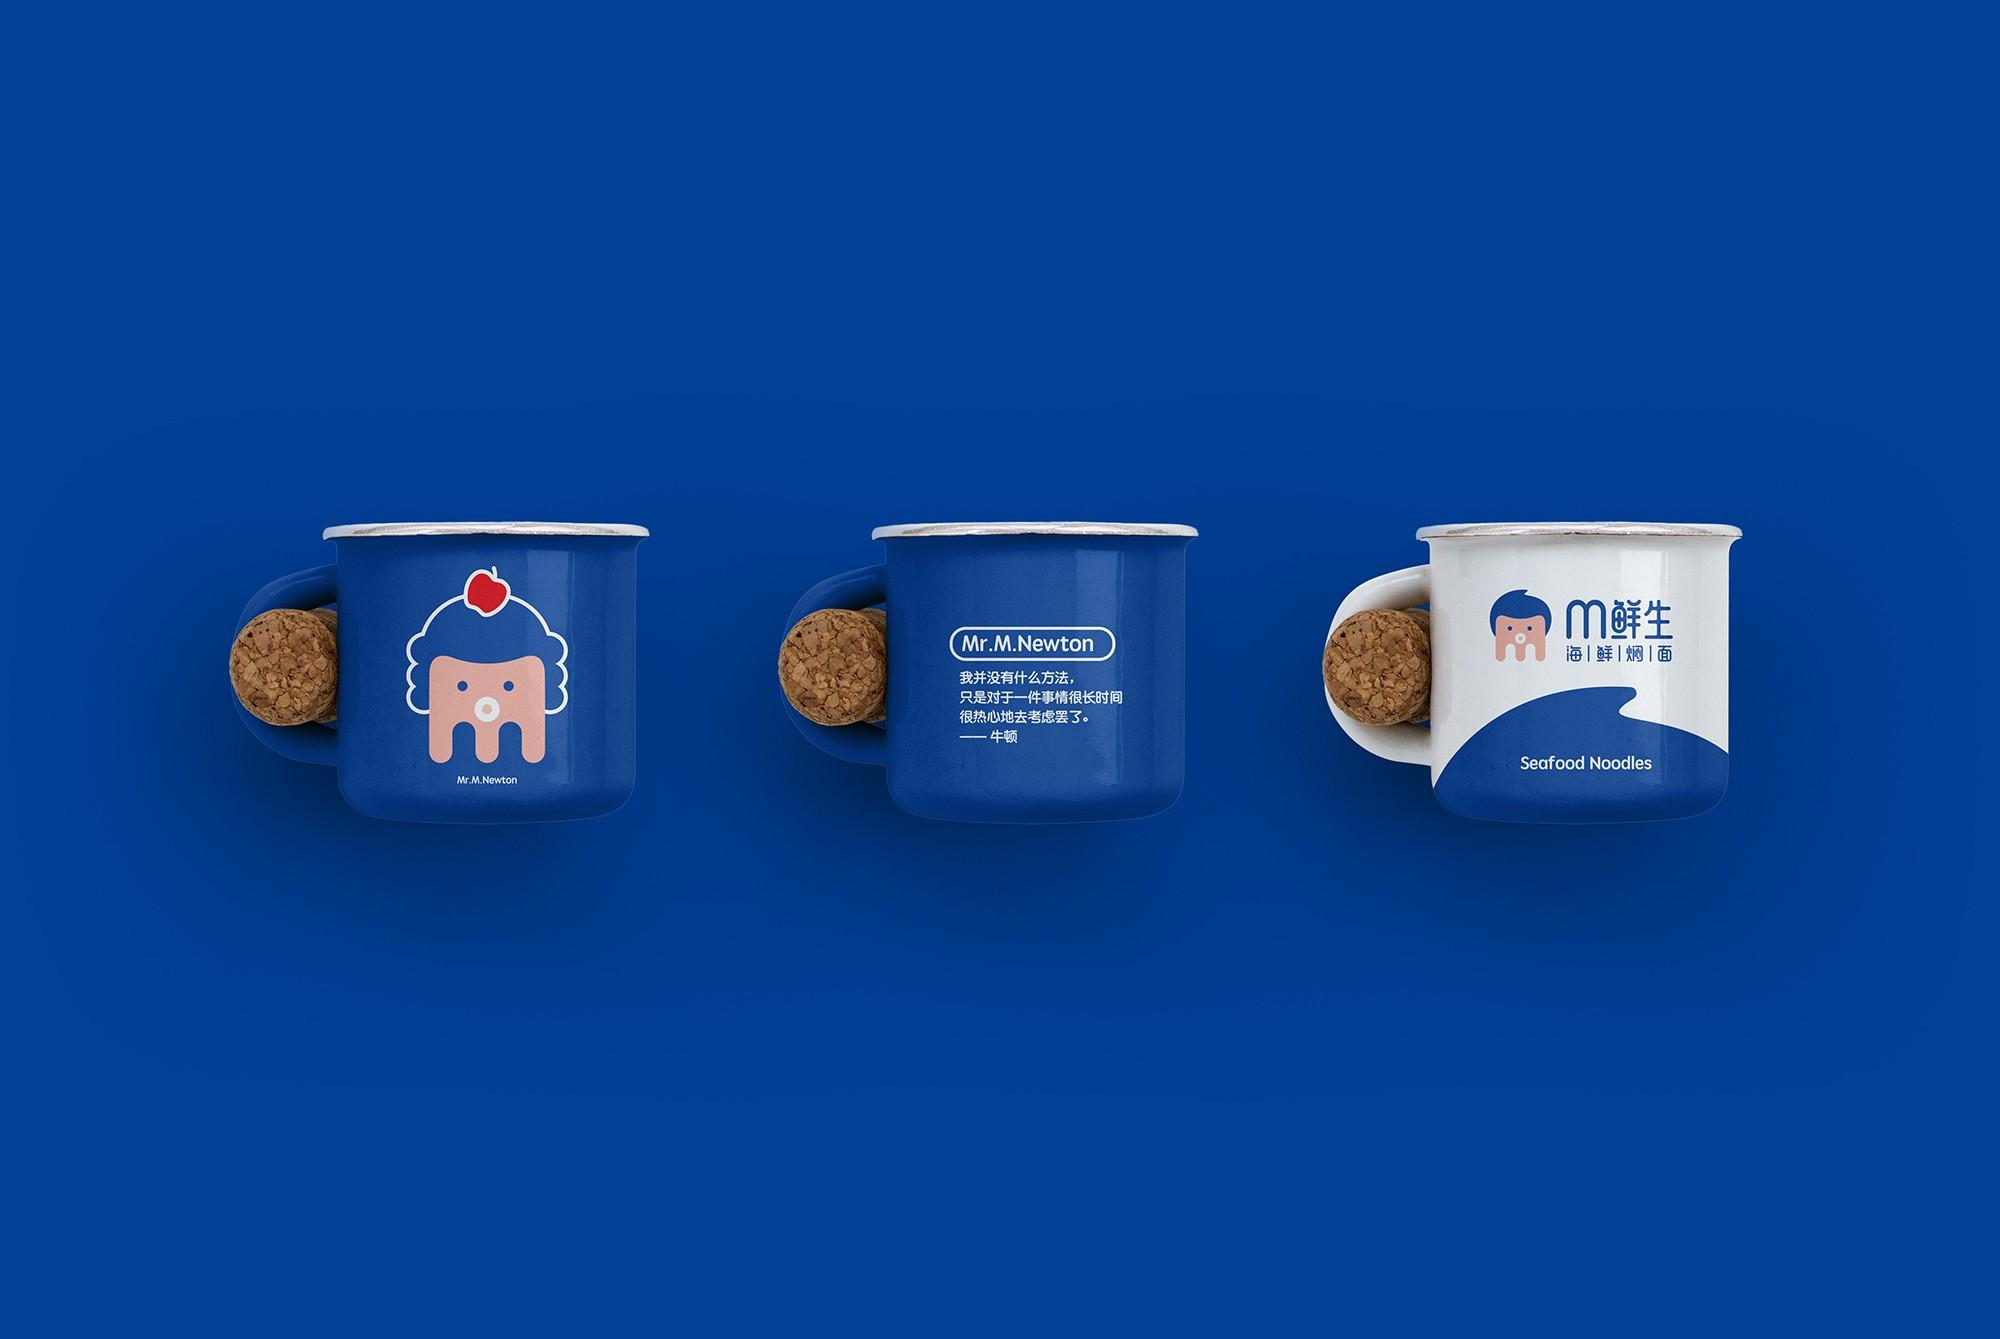 M鲜生海鲜焖面品牌形象设计-杯子